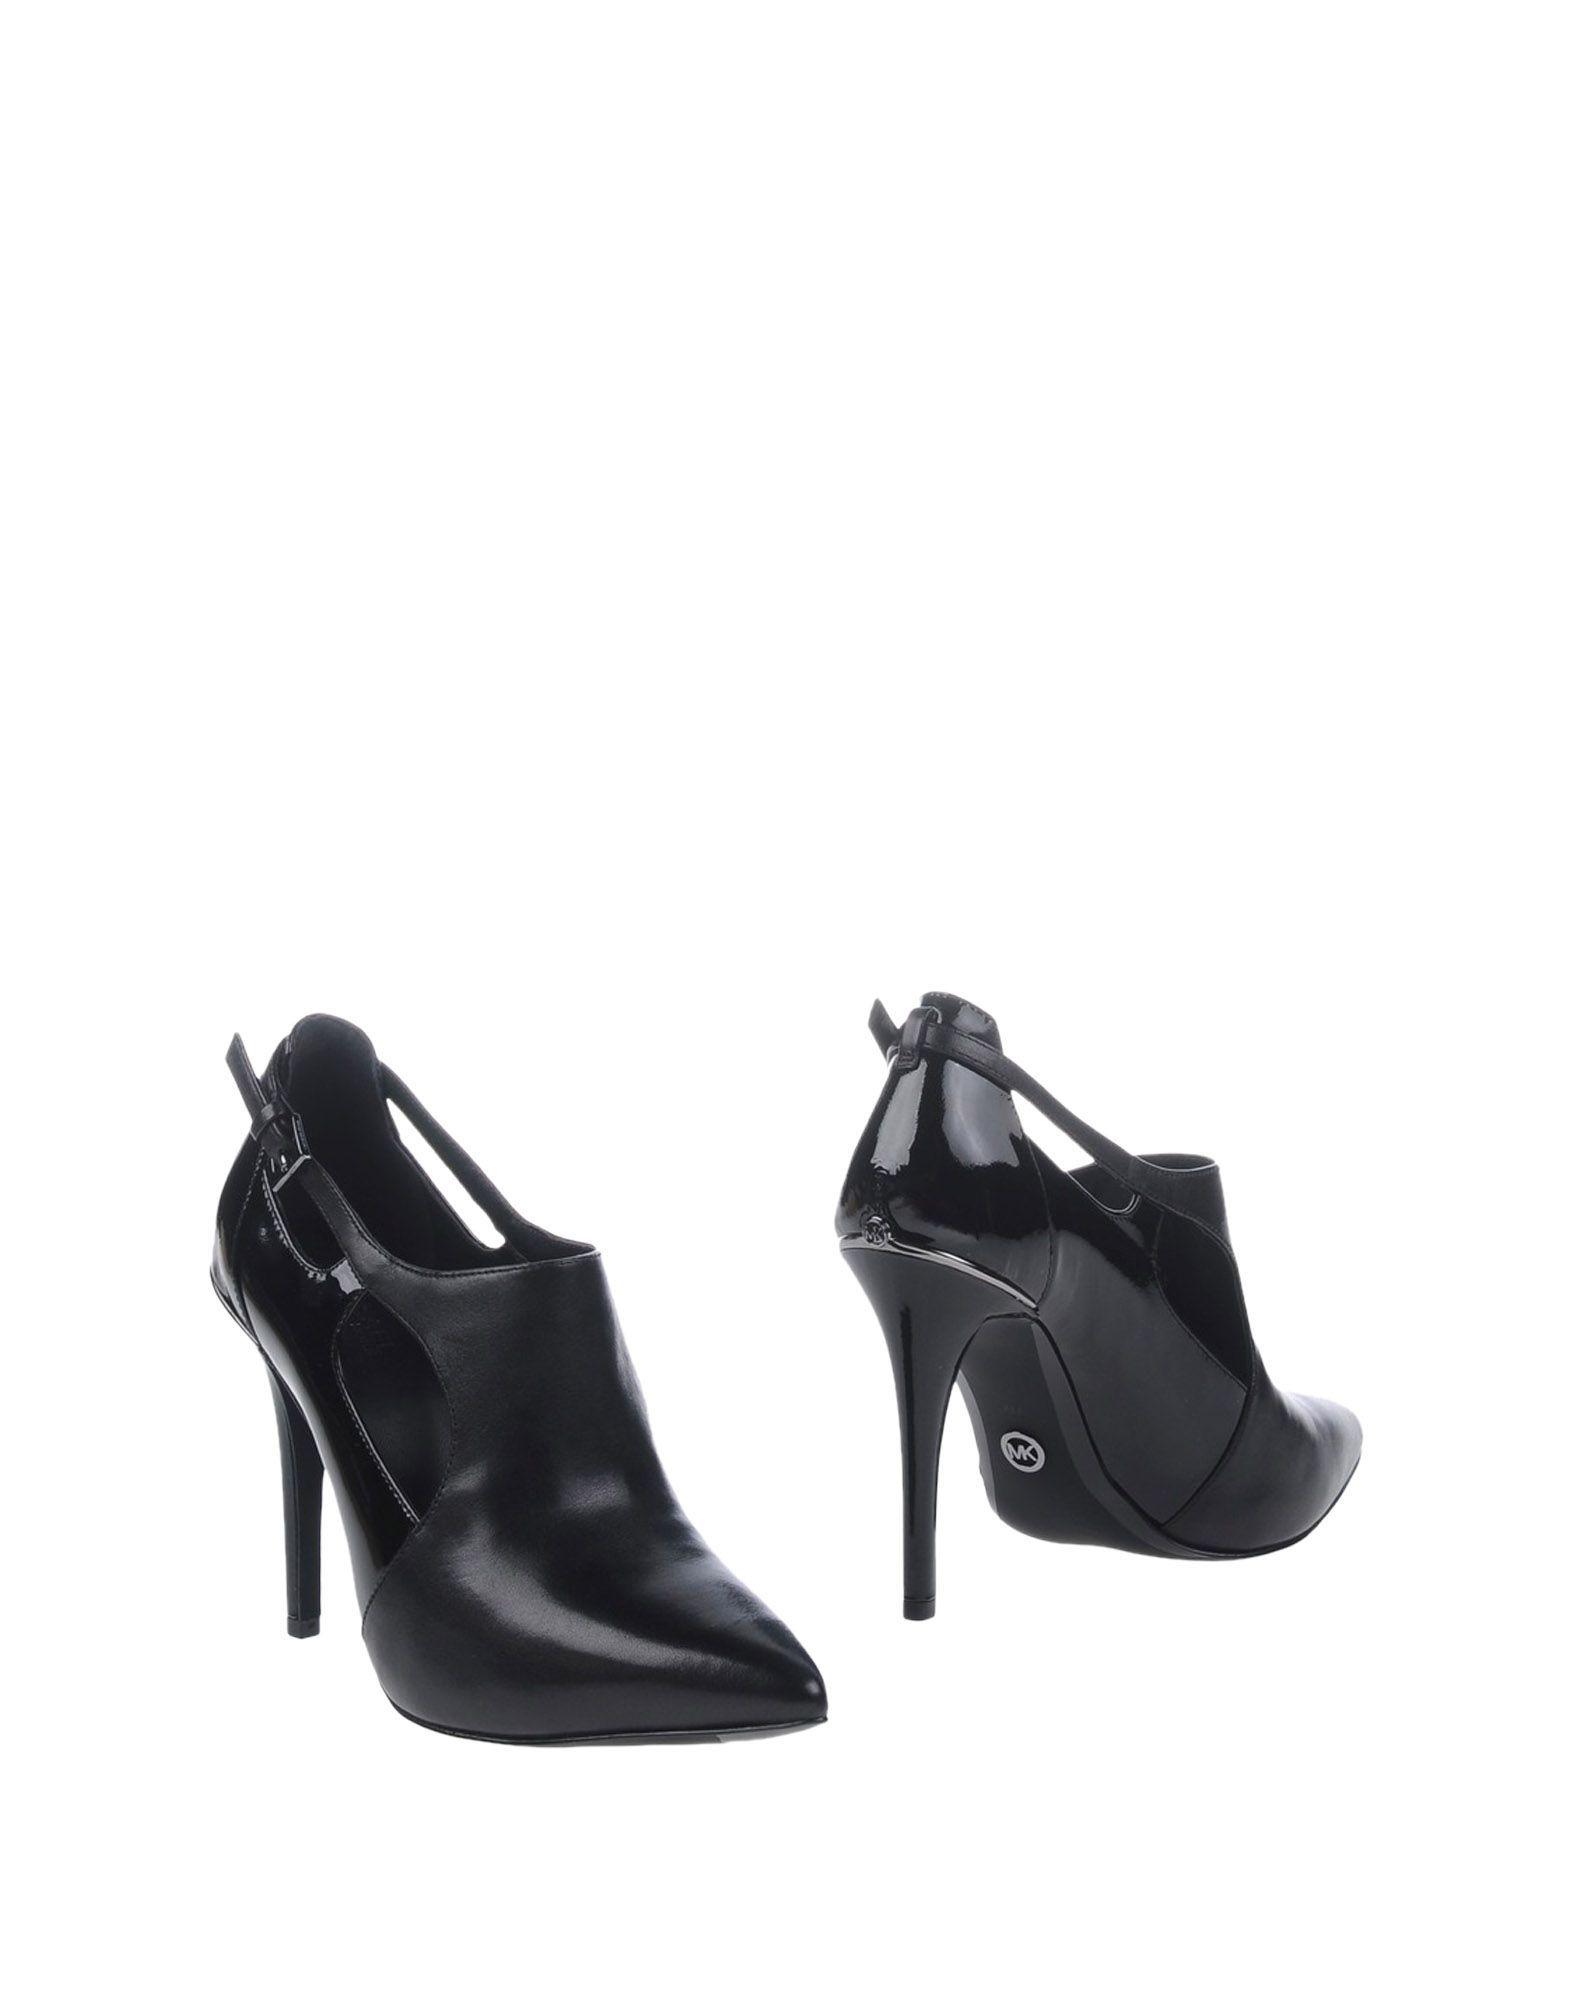 FOOTWEAR Michael Michael Kors Black Woman Leather